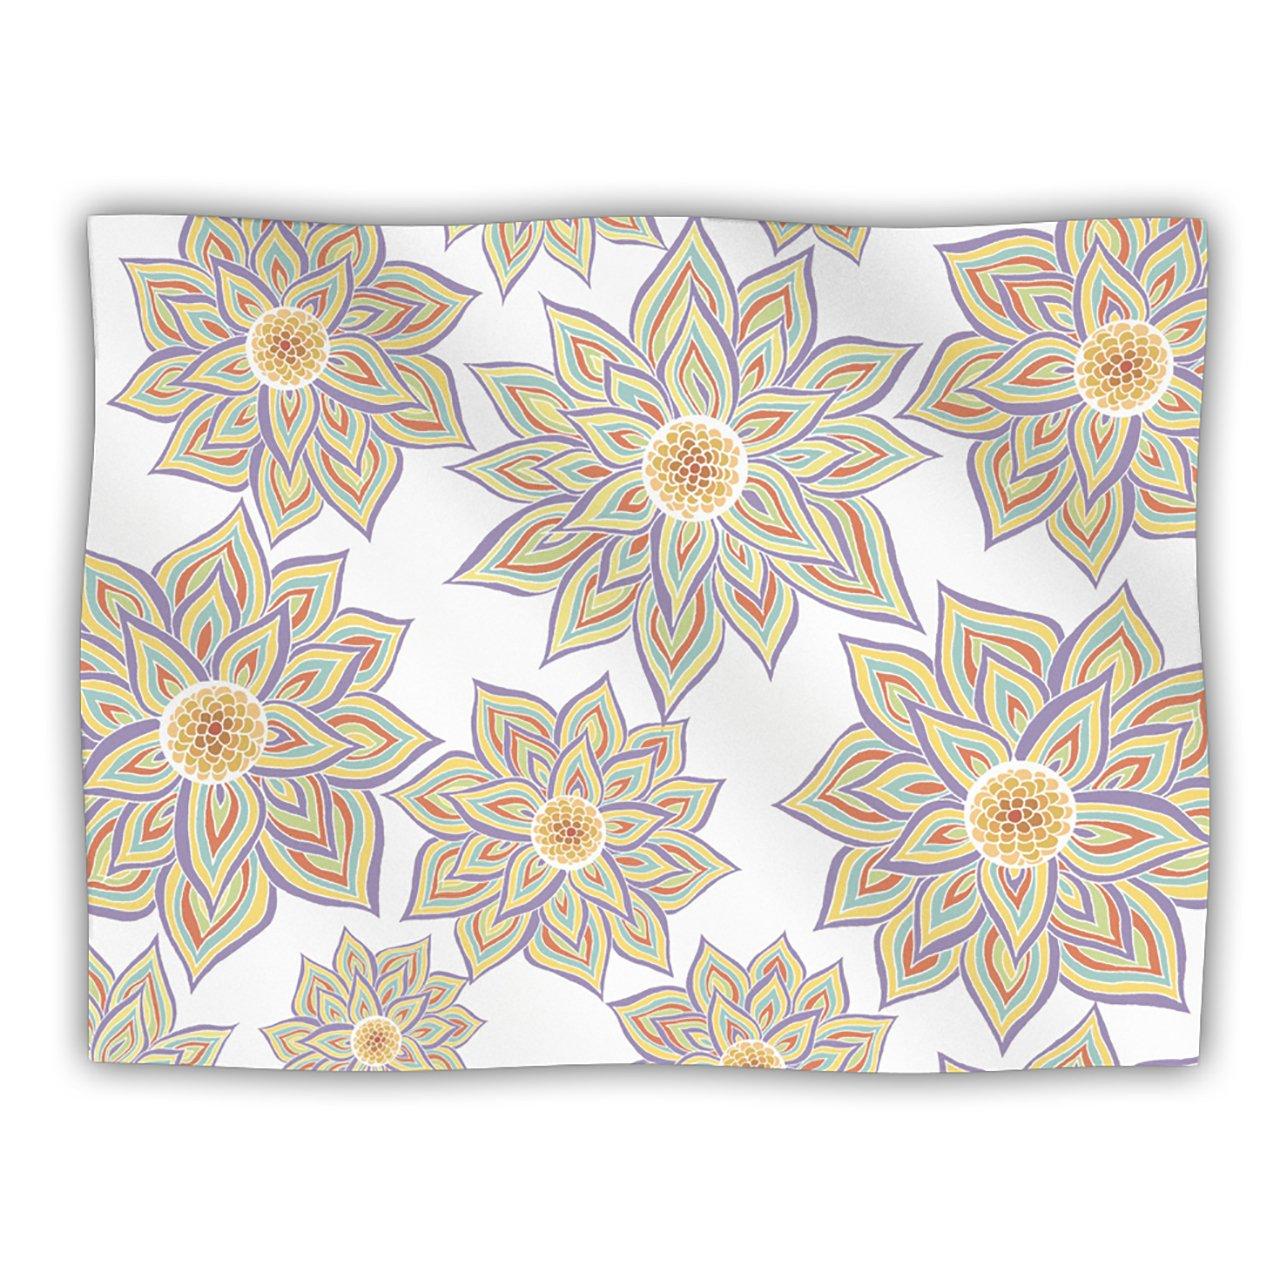 Kess InHouse Pom Graphic Design 'Floral Dance' Dog Blanket, 40 by 30-Inch